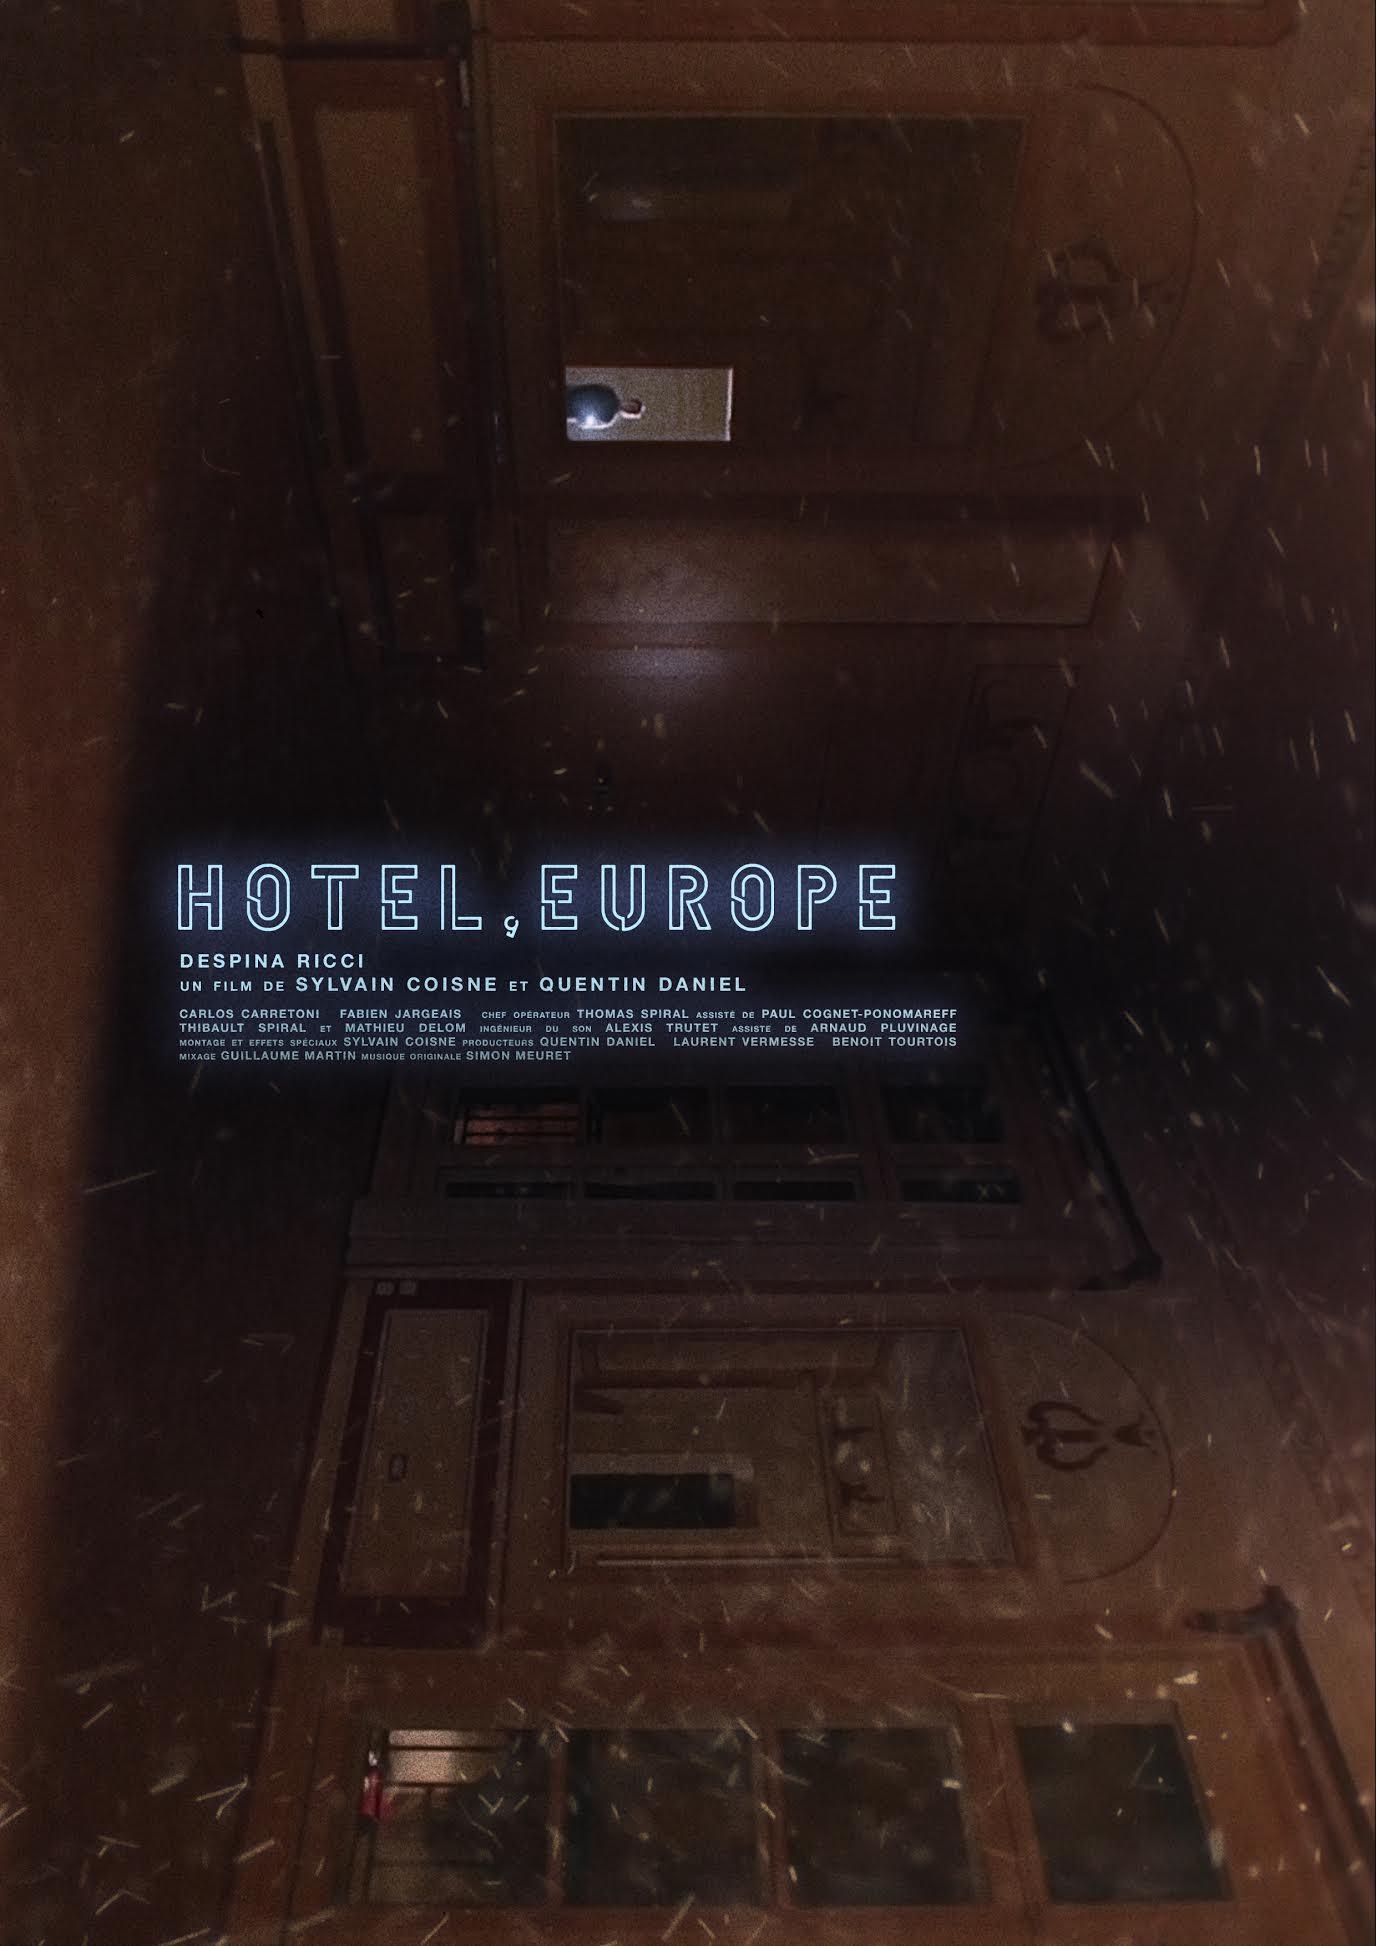 3 - hoteleurope_2015.jpg